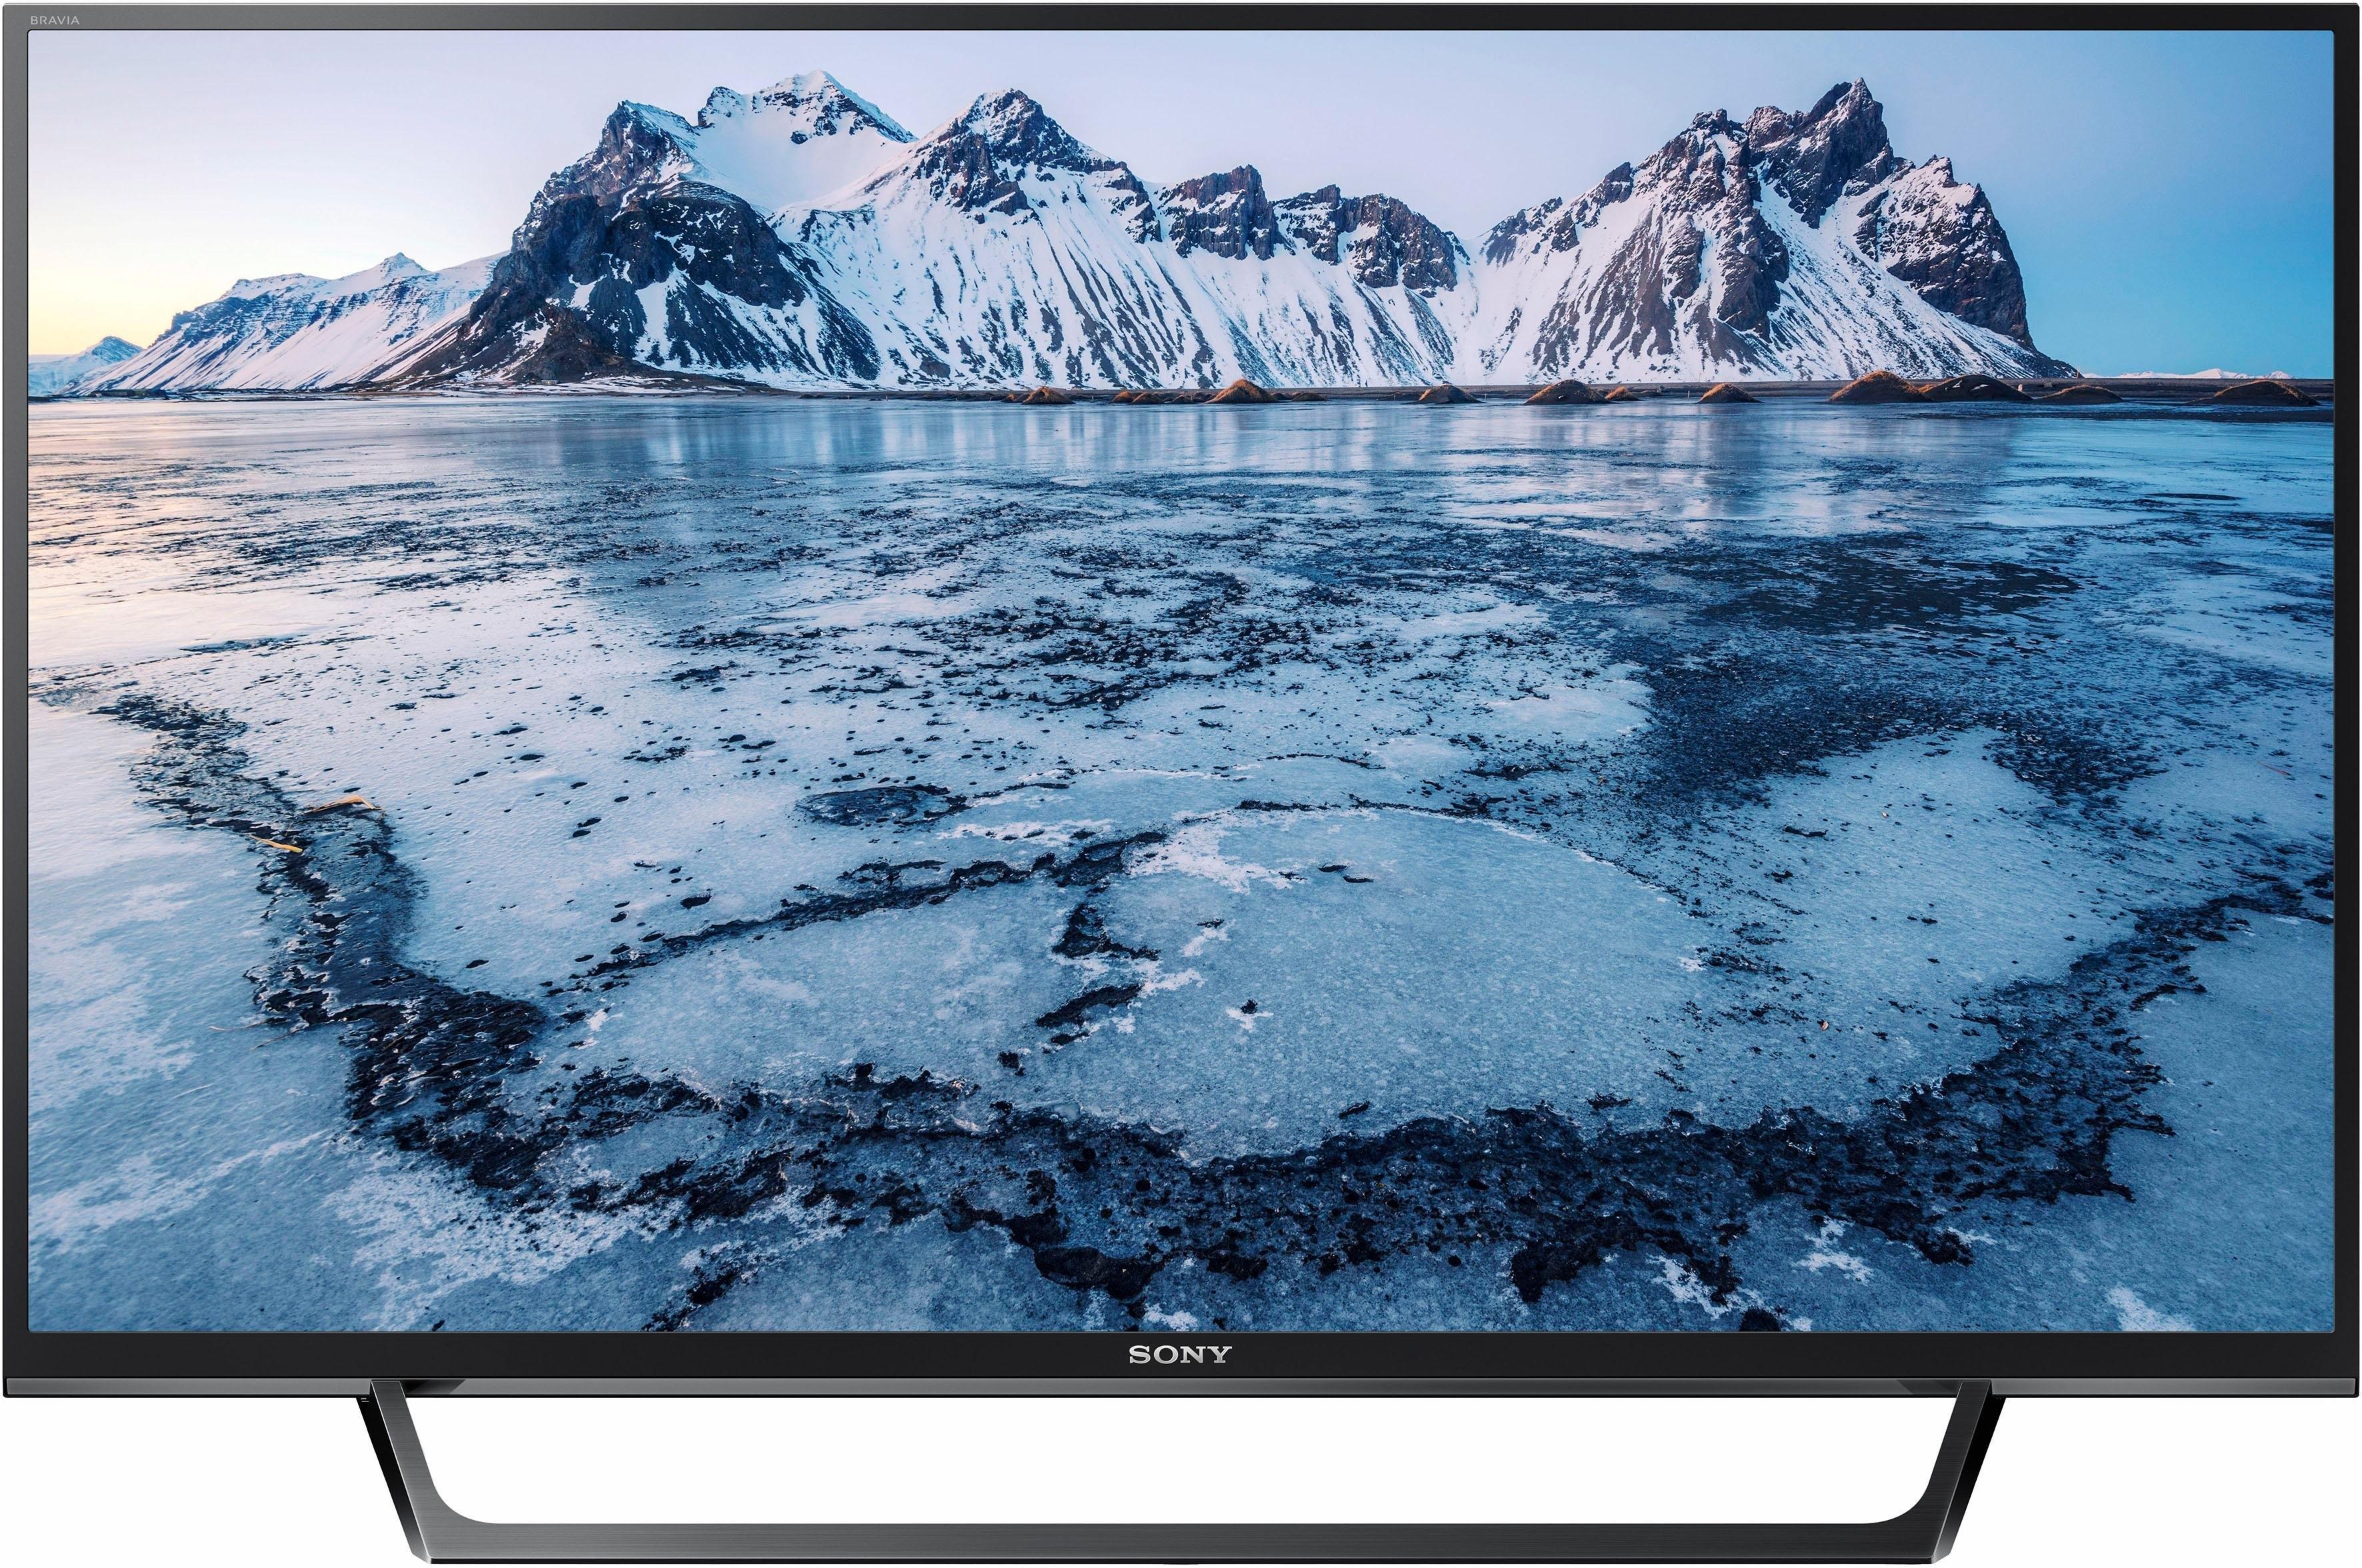 SONY KDL49WE665BAEP LED-TV (123 cm/49 inch, Full HD, Smart-TV) online kopen op otto.nl